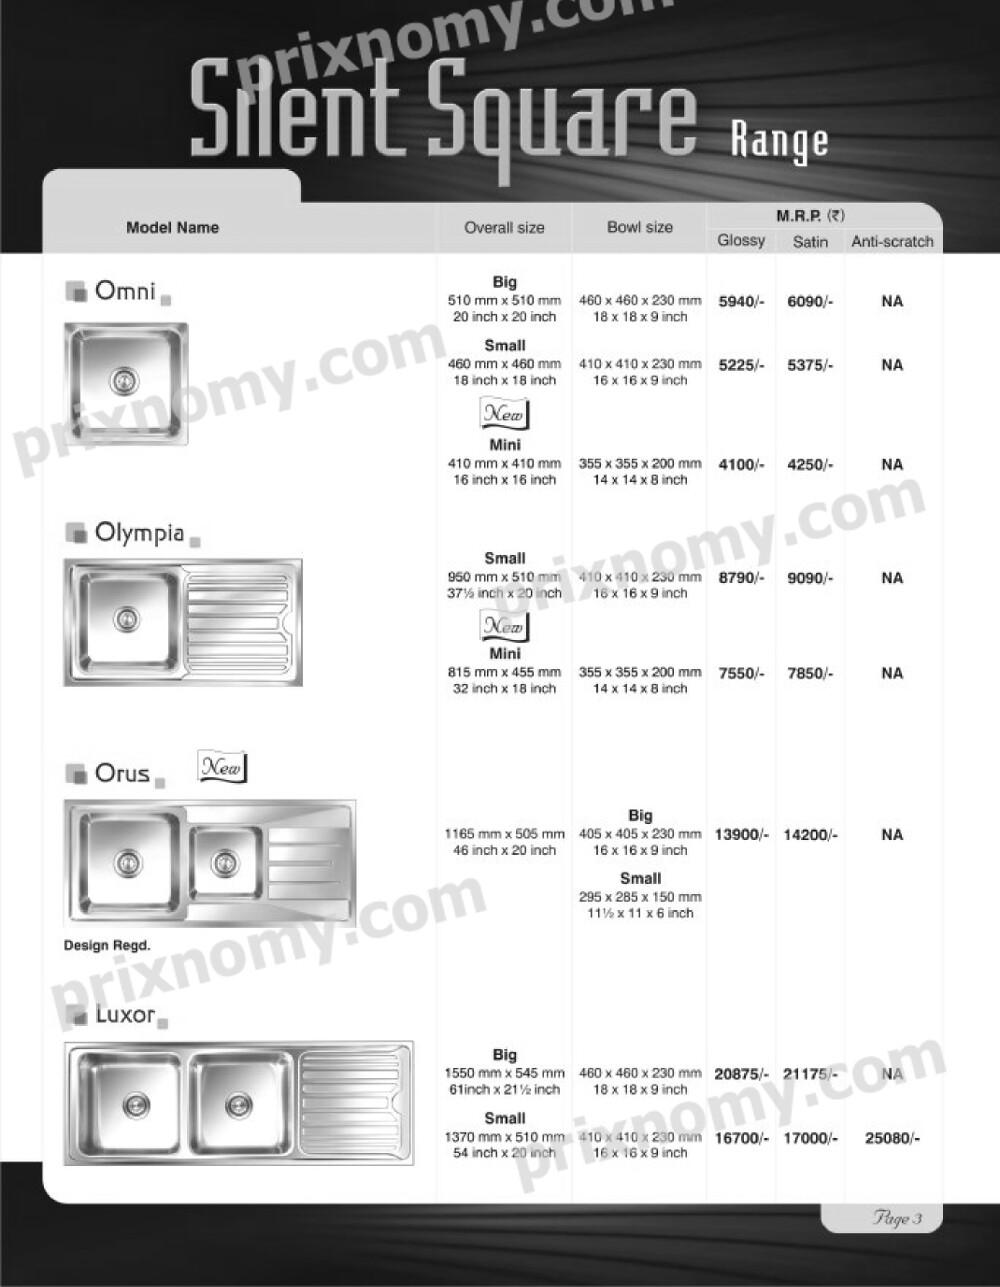 Nirali kitchen sinks price list 2014 prixnomy silent square range best prices silent square range supplier silent square range manufacturer workwithnaturefo